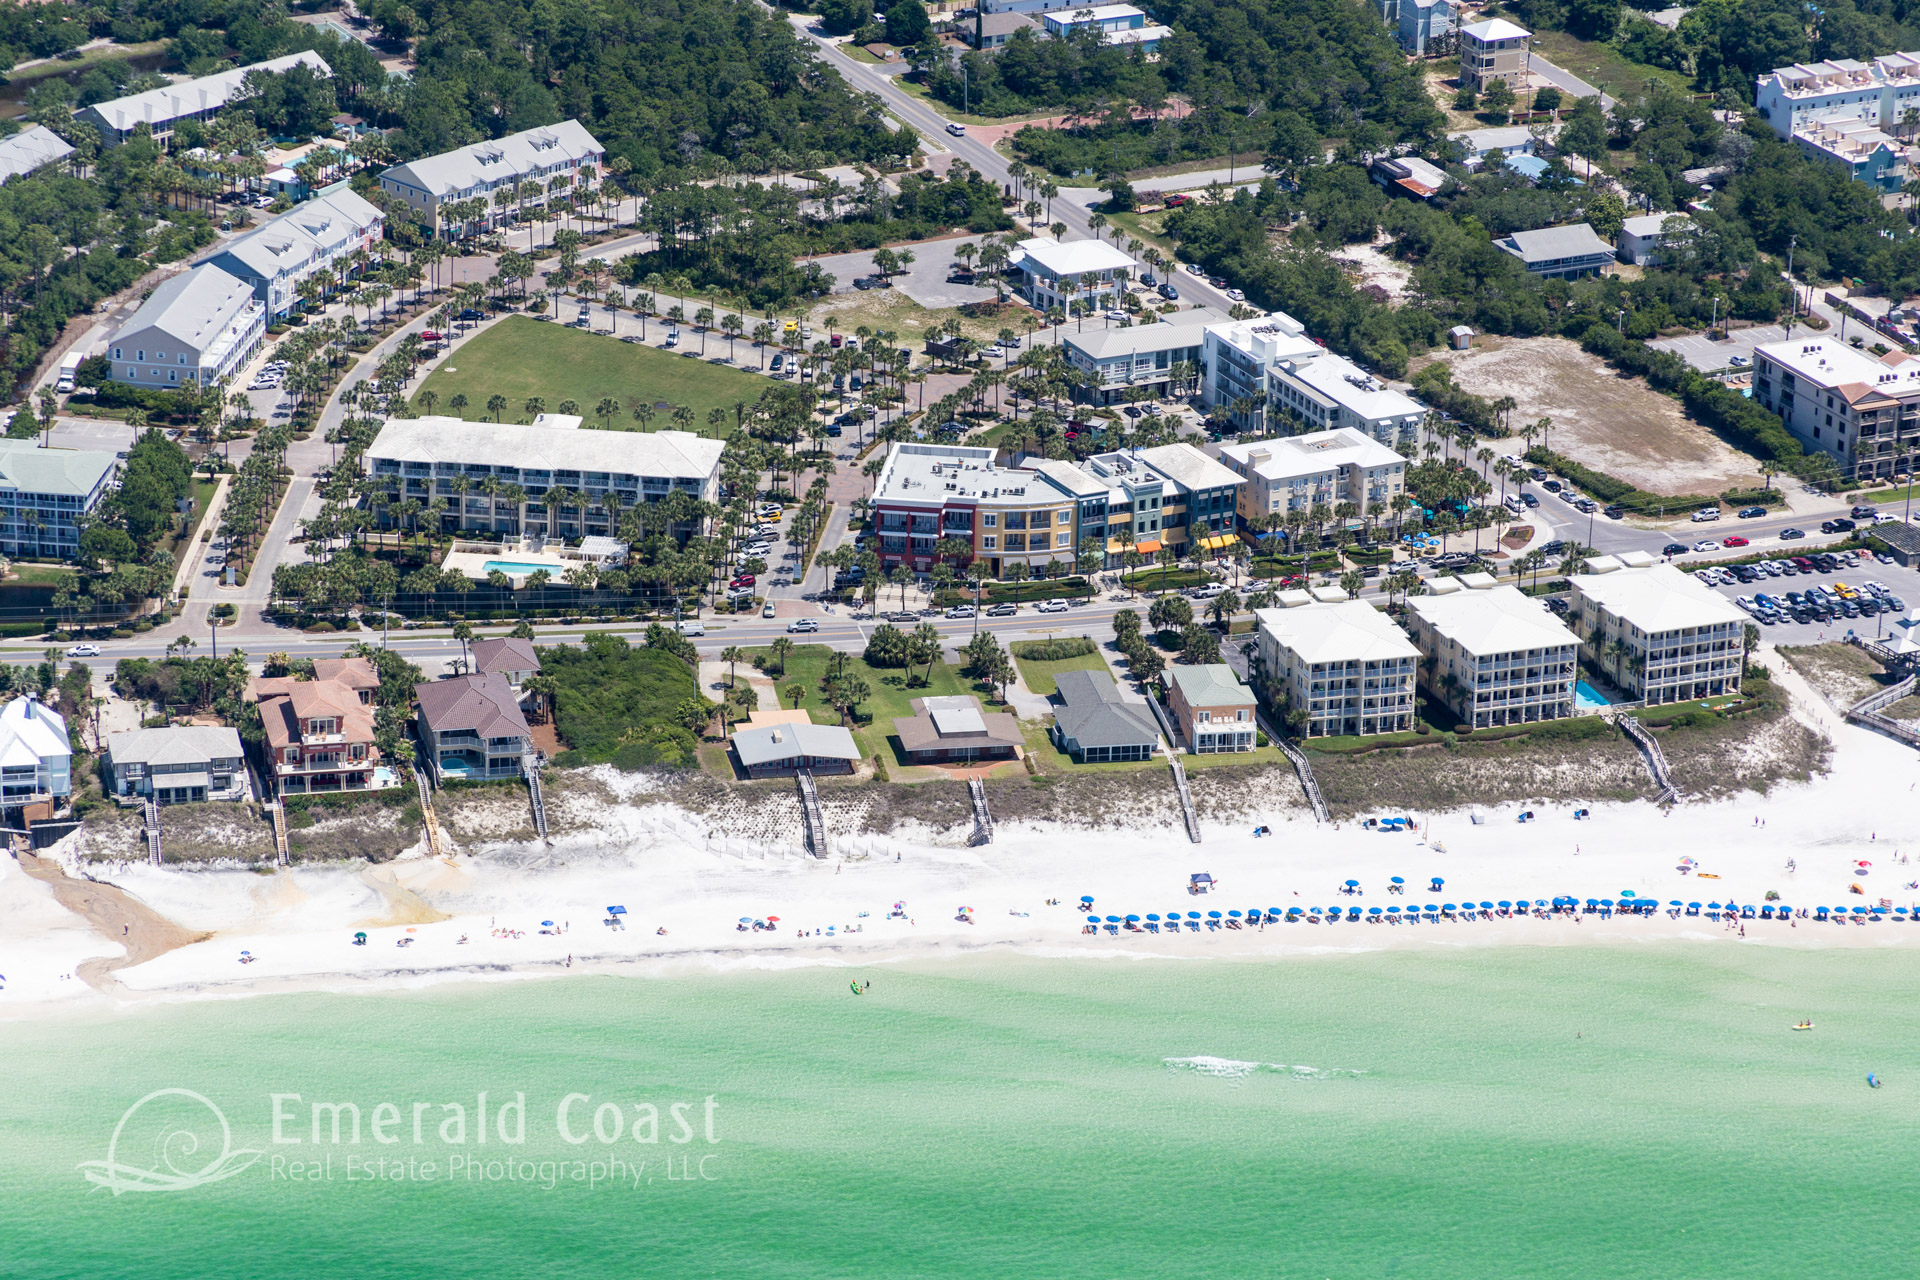 Aerial View of Gulf Place on Co Hwy 30A Santa Rosa Beach, Floirda